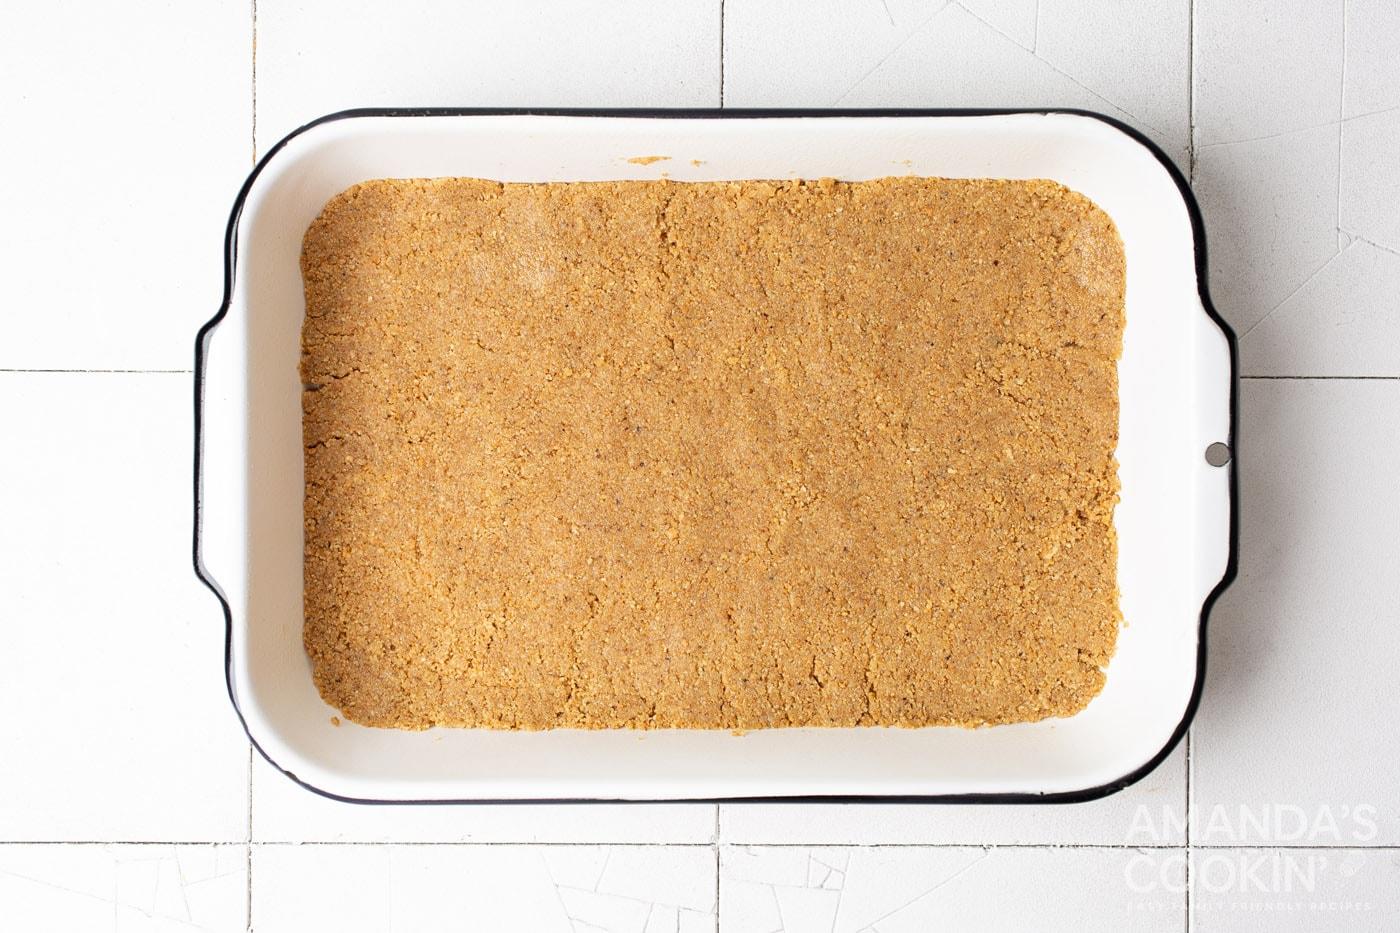 graham cracker crust in a baking pan